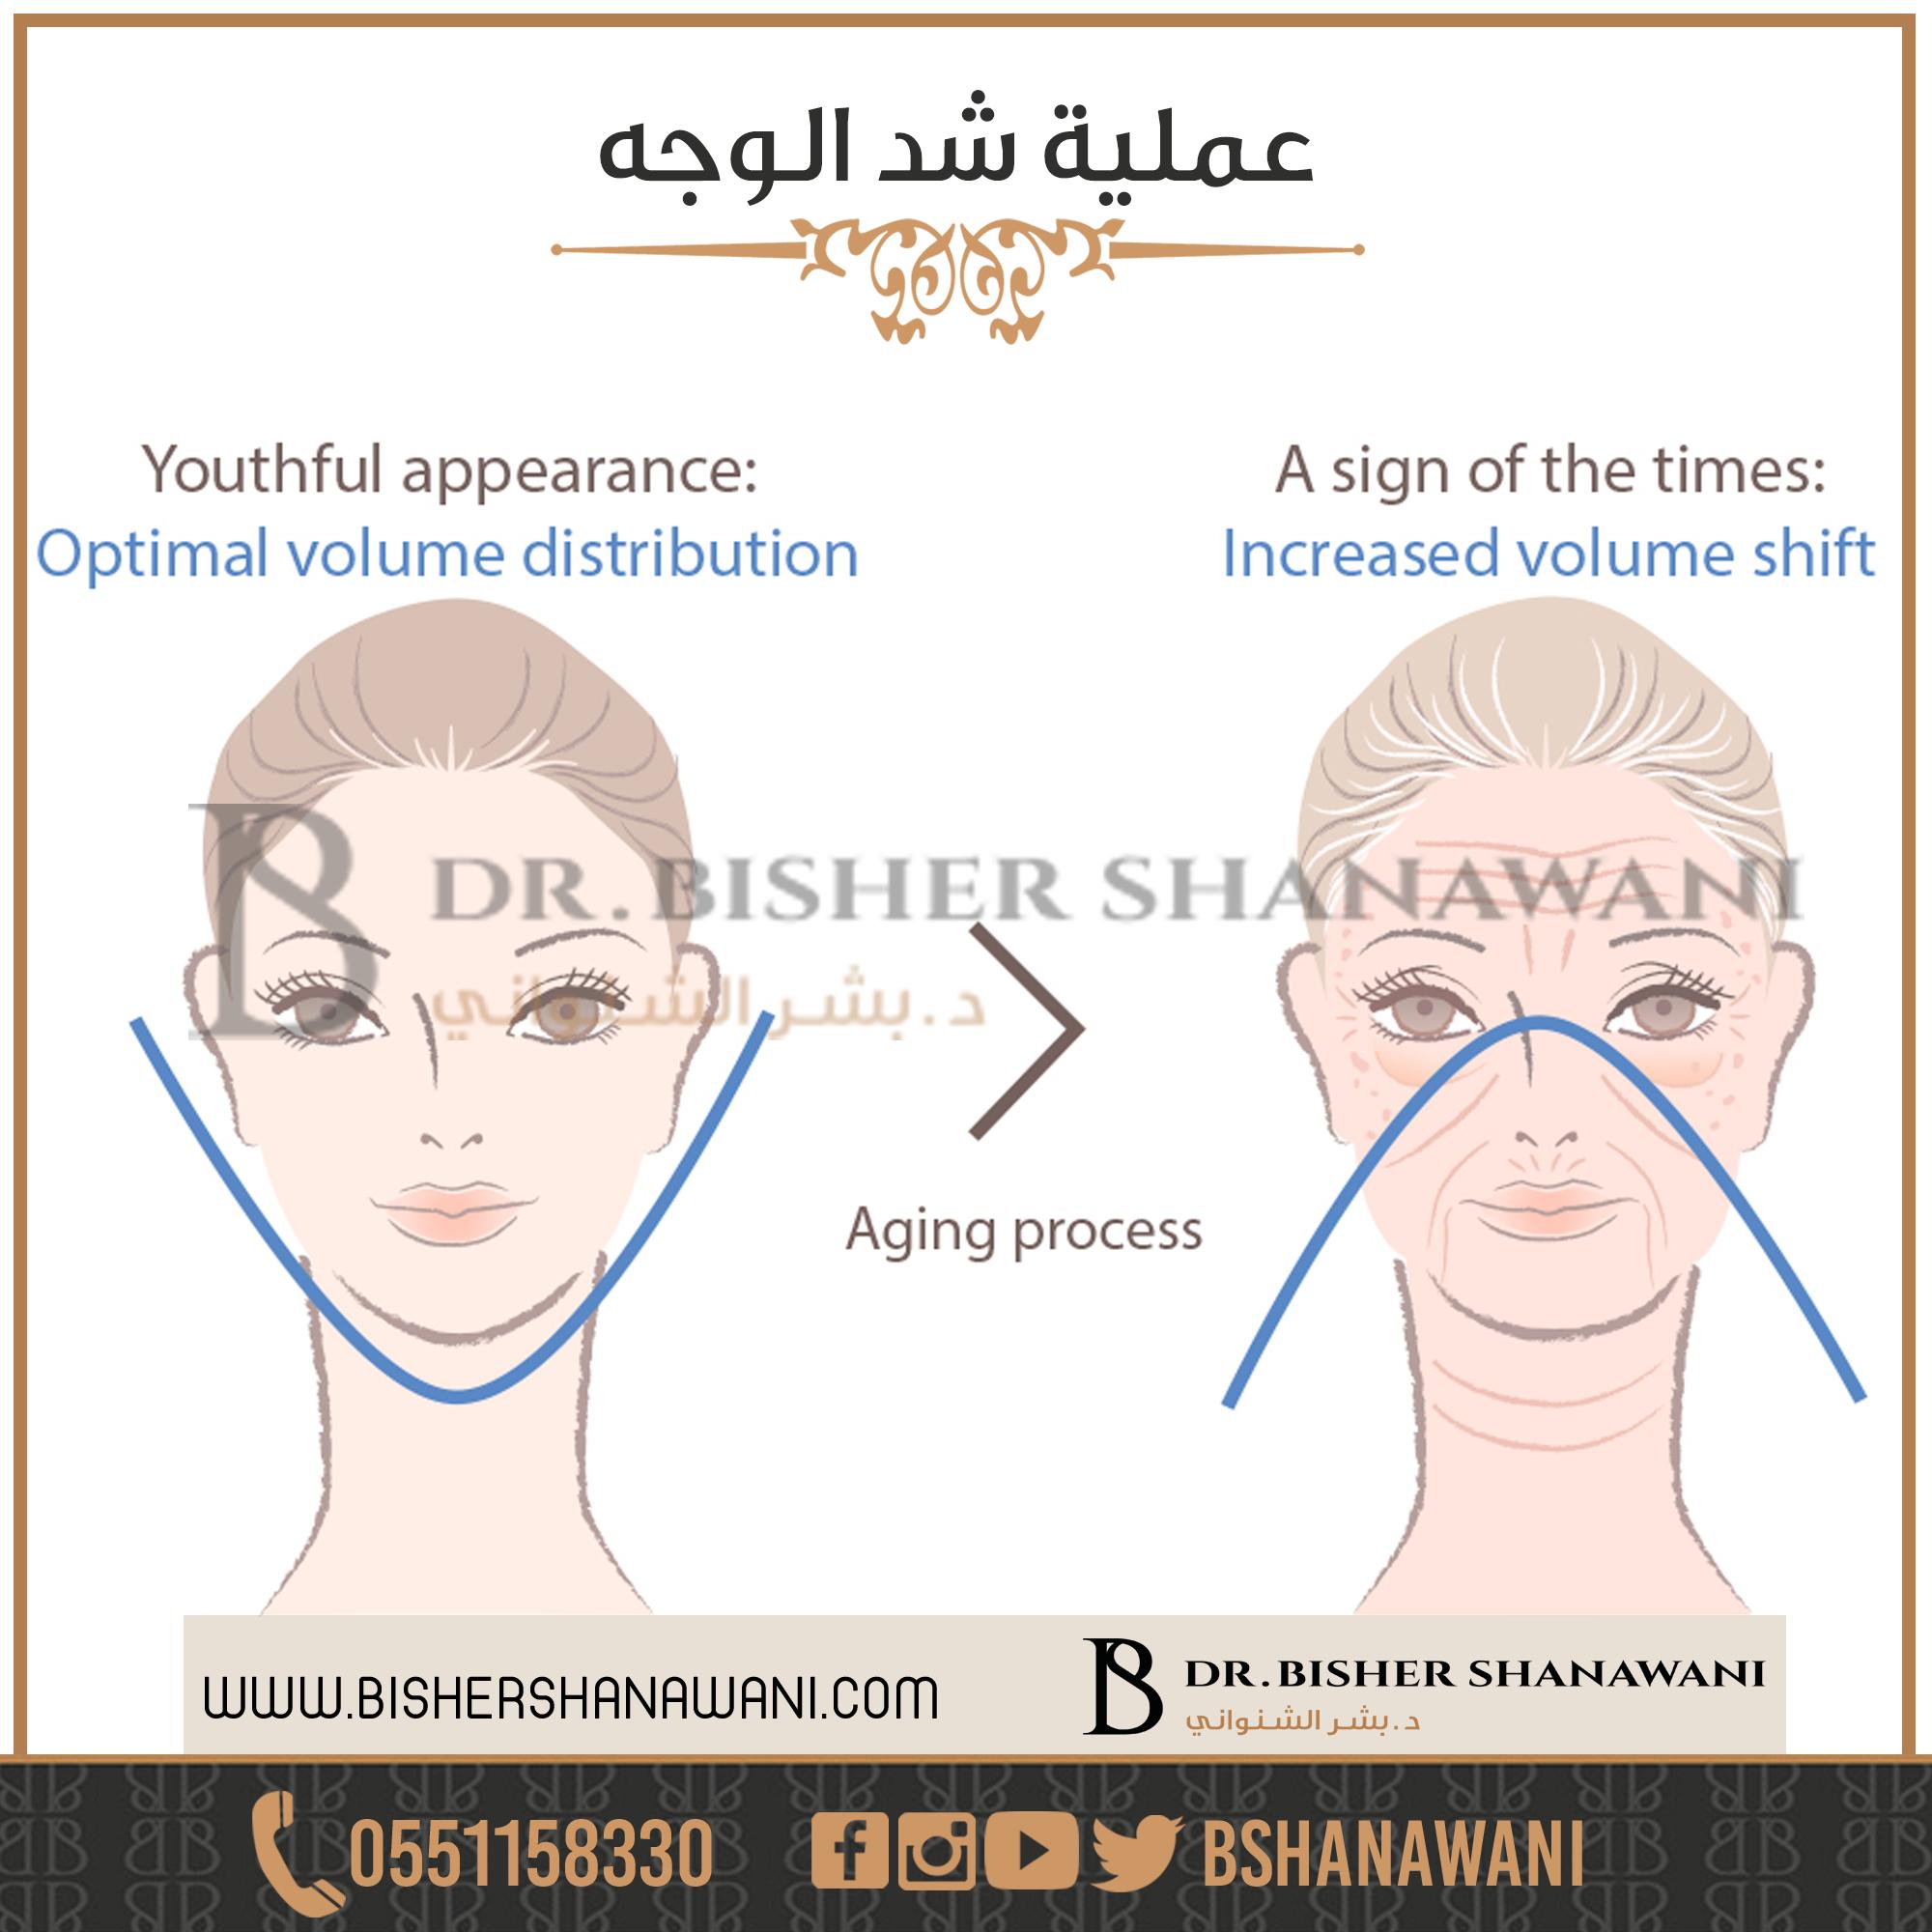 Bshanawaniعملية شد الوجه المعروفة علميا باسم Face Lift أو عملية Rhytidectomy هي عملية يتم فيها التخلص من تجاعيد الوجه وش Plastic Surgery Neck Lift Surgery